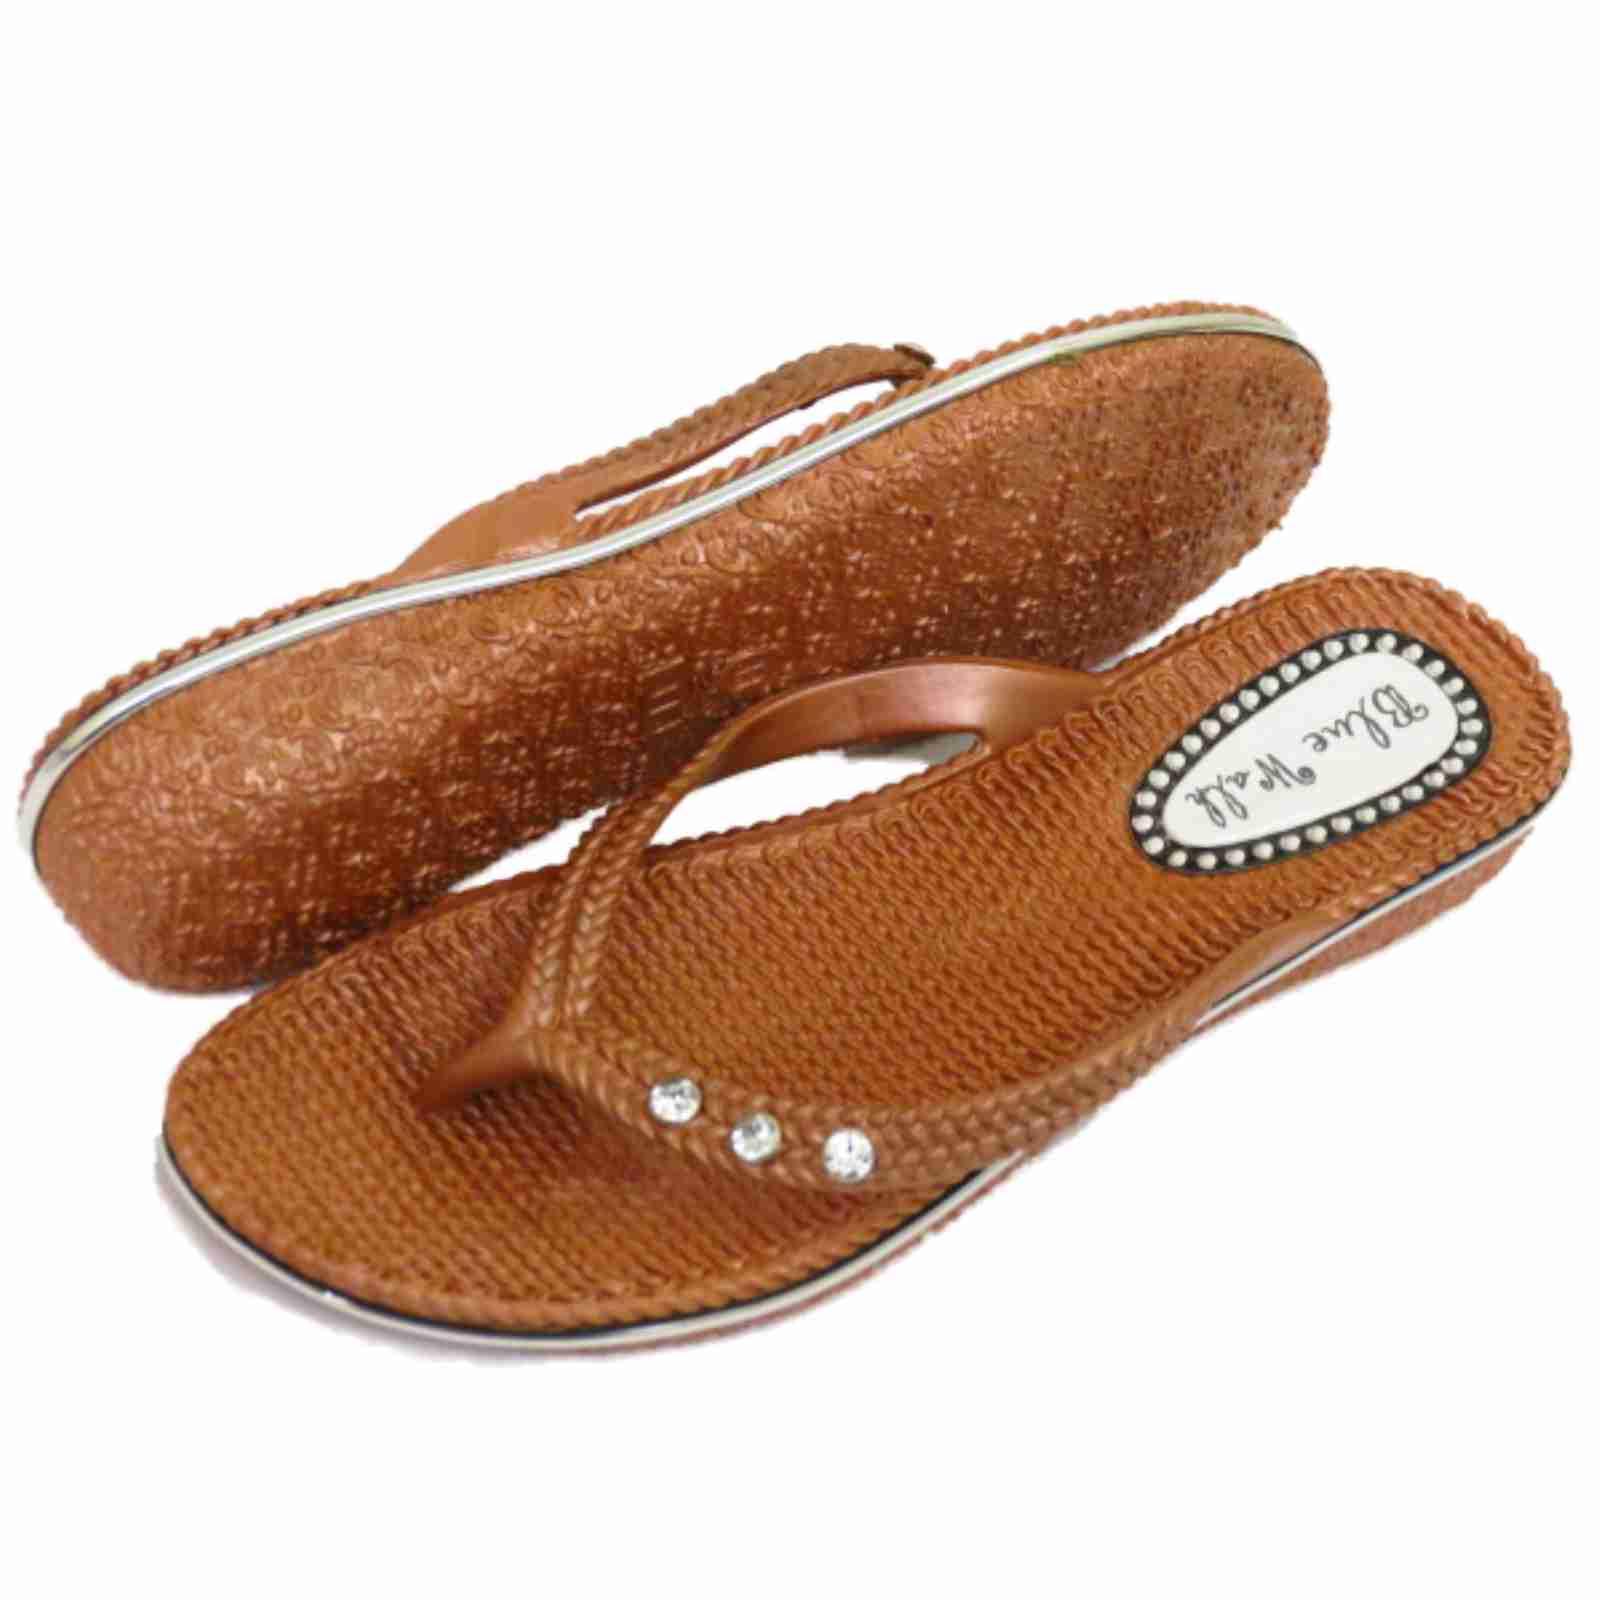 femmes plates bronze sandales tongs tongs plage vacances string chaussure t 3 ebay. Black Bedroom Furniture Sets. Home Design Ideas